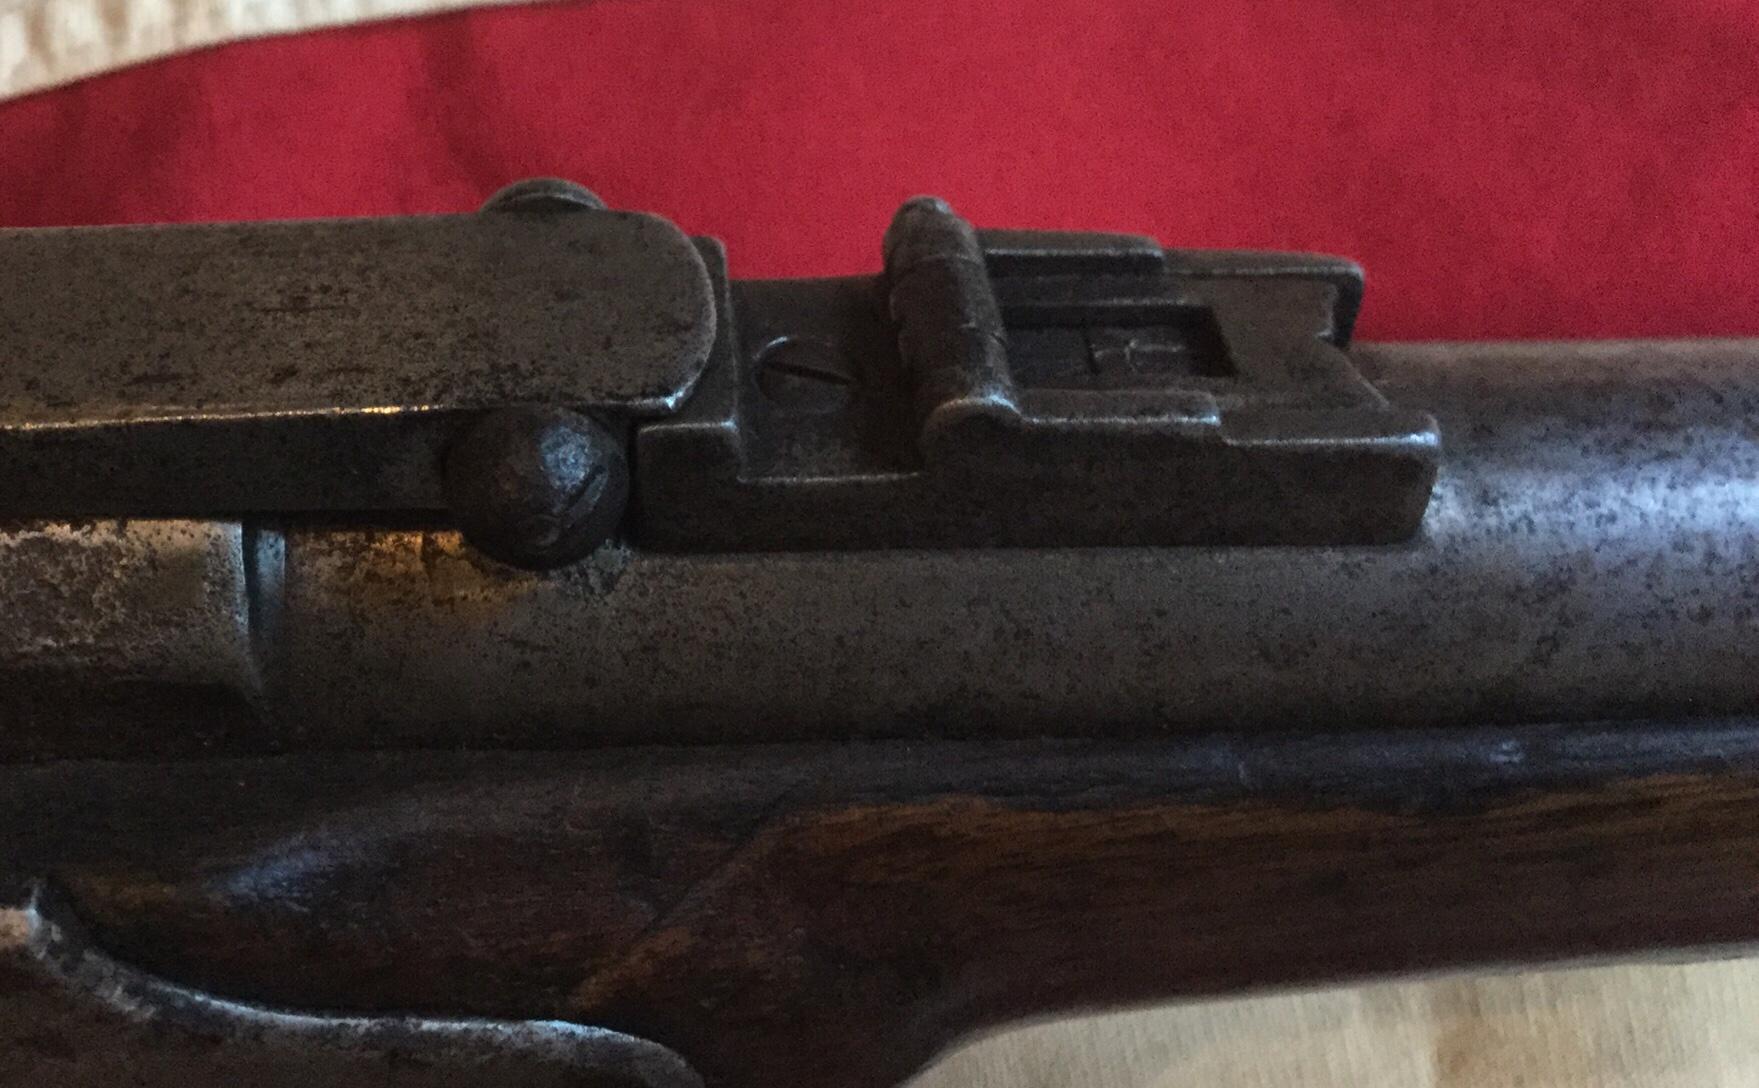 Merrill Carbine, Button Type Latch